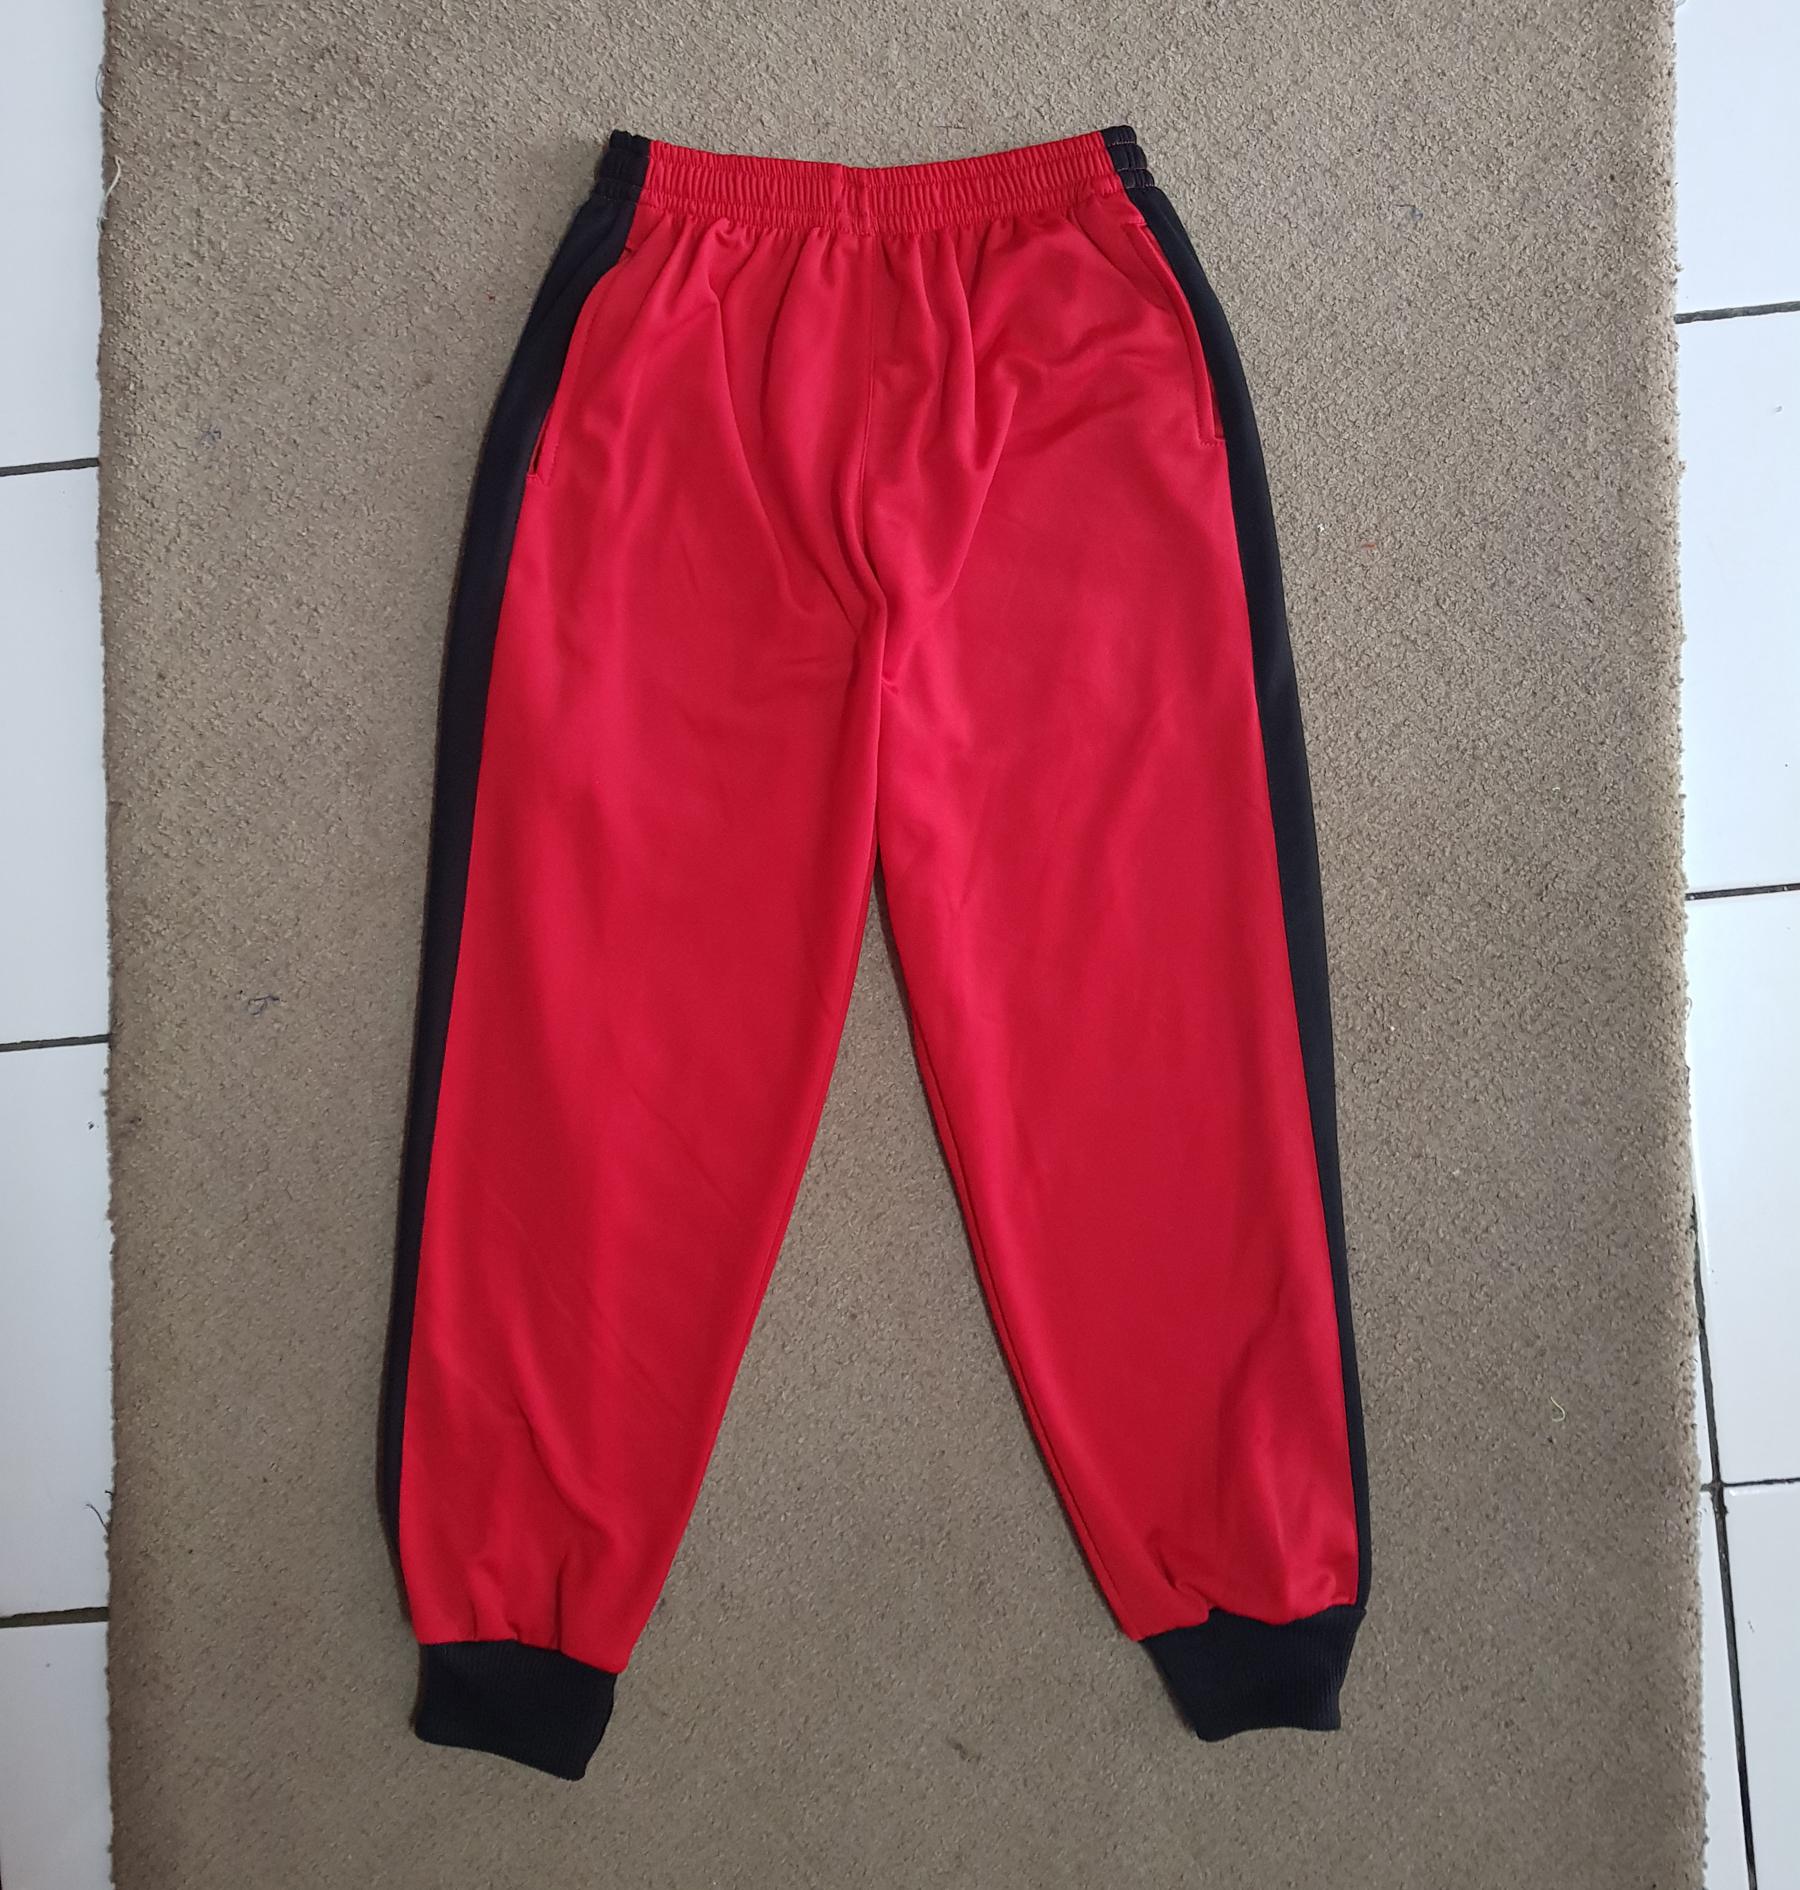 Seragam Training Serumpun, Kaos dan Celana